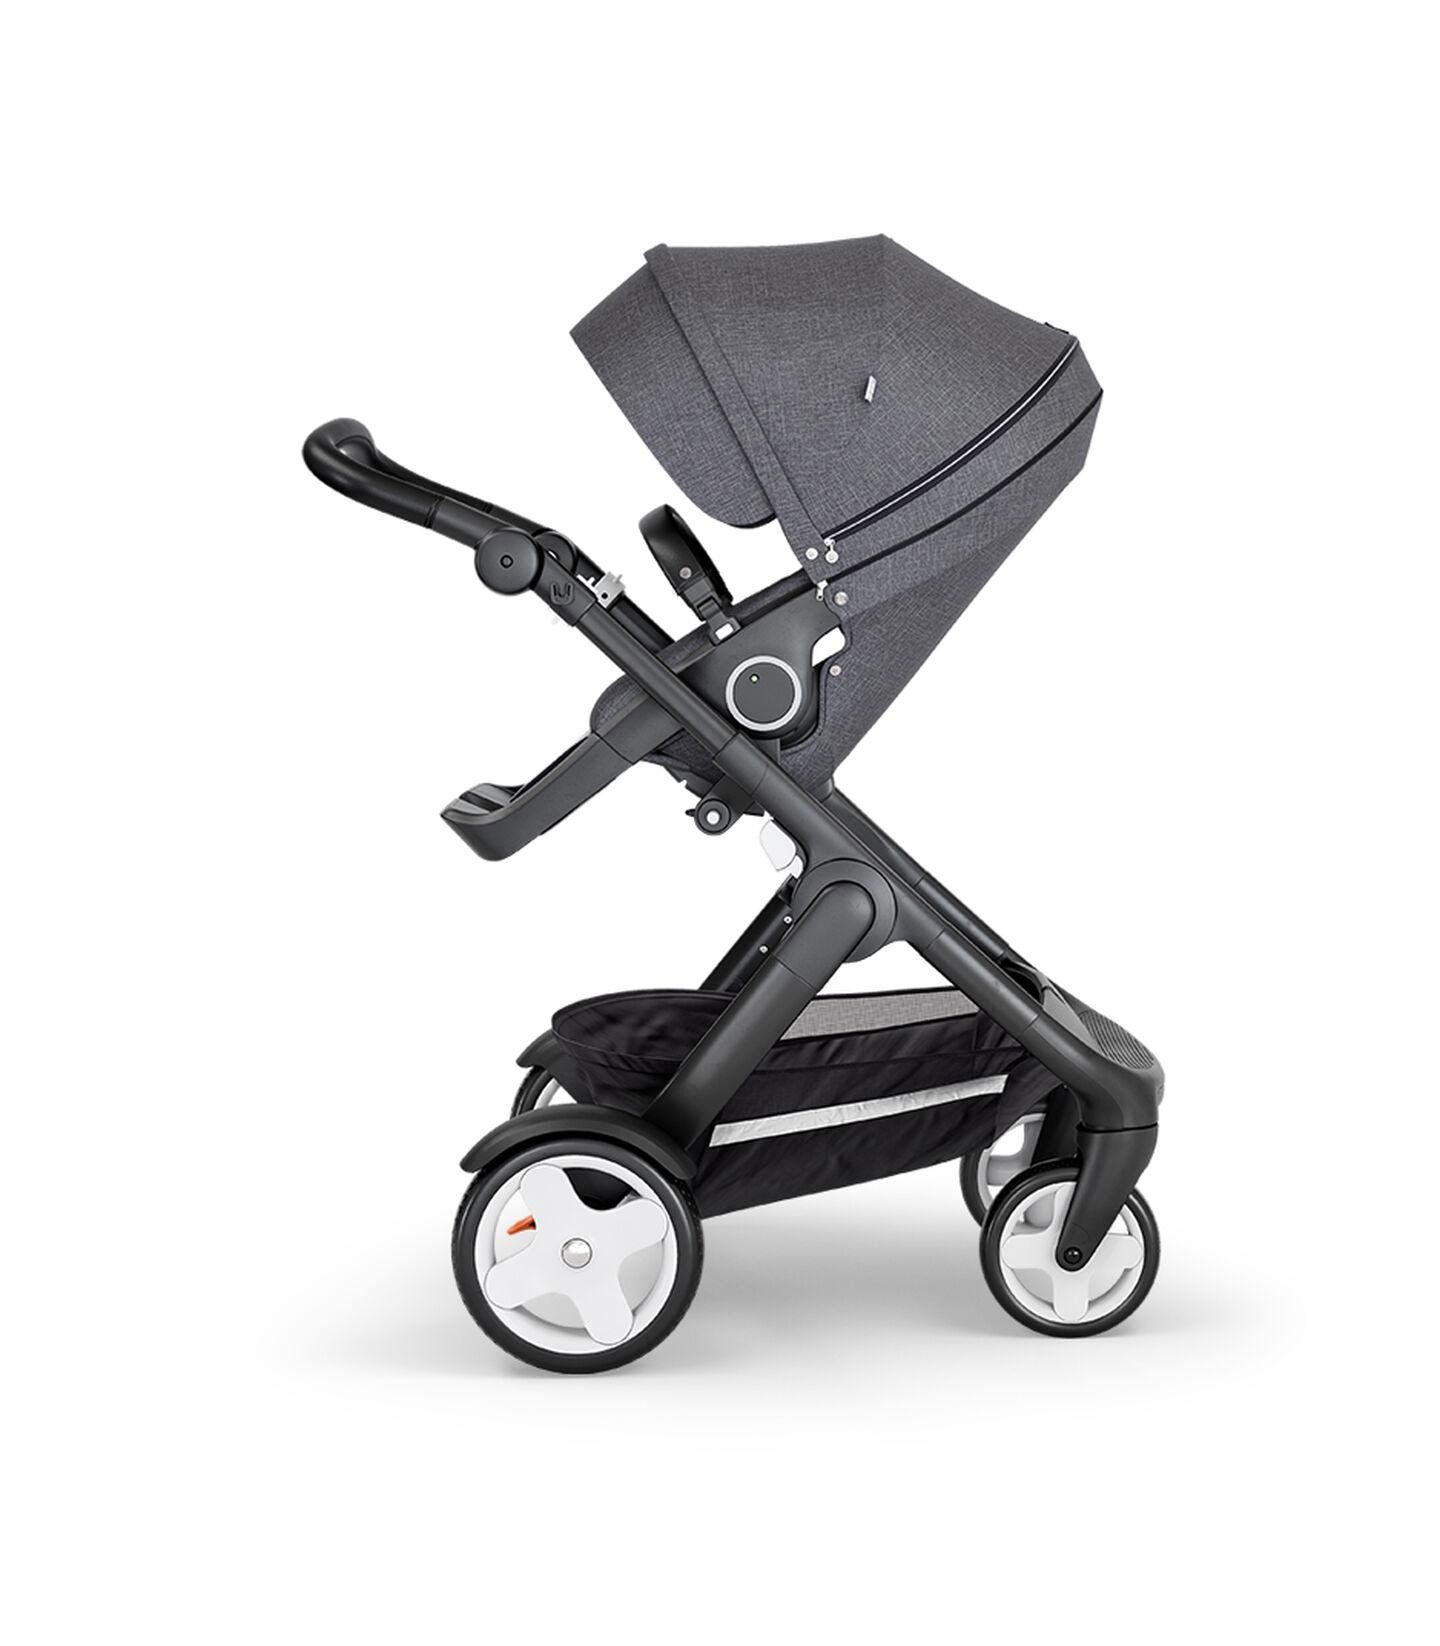 Stokke® Trailz™ with Black Chassis, Black Leatherette and Classic Wheels. Stokke® Stroller Seat, Black Melange.